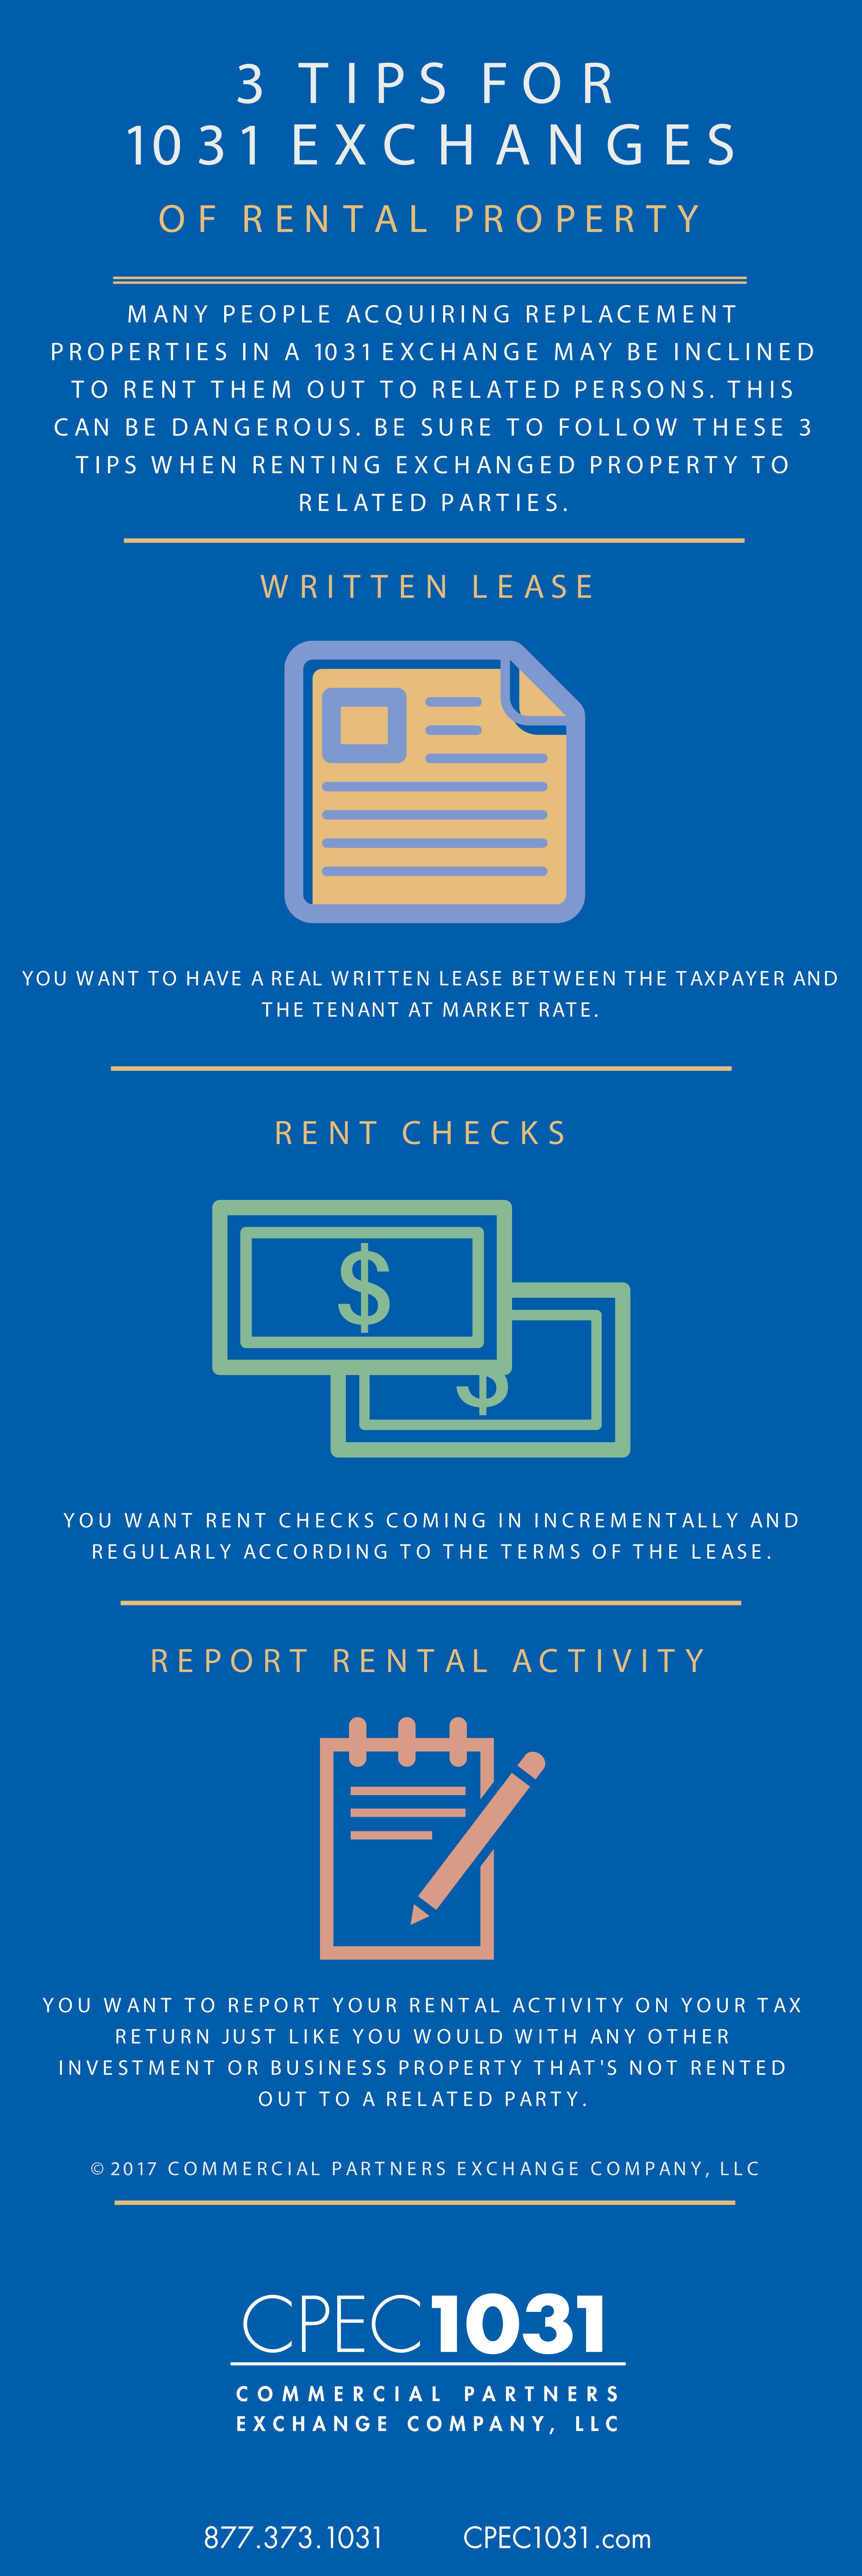 Rental Property 1031 Exchange